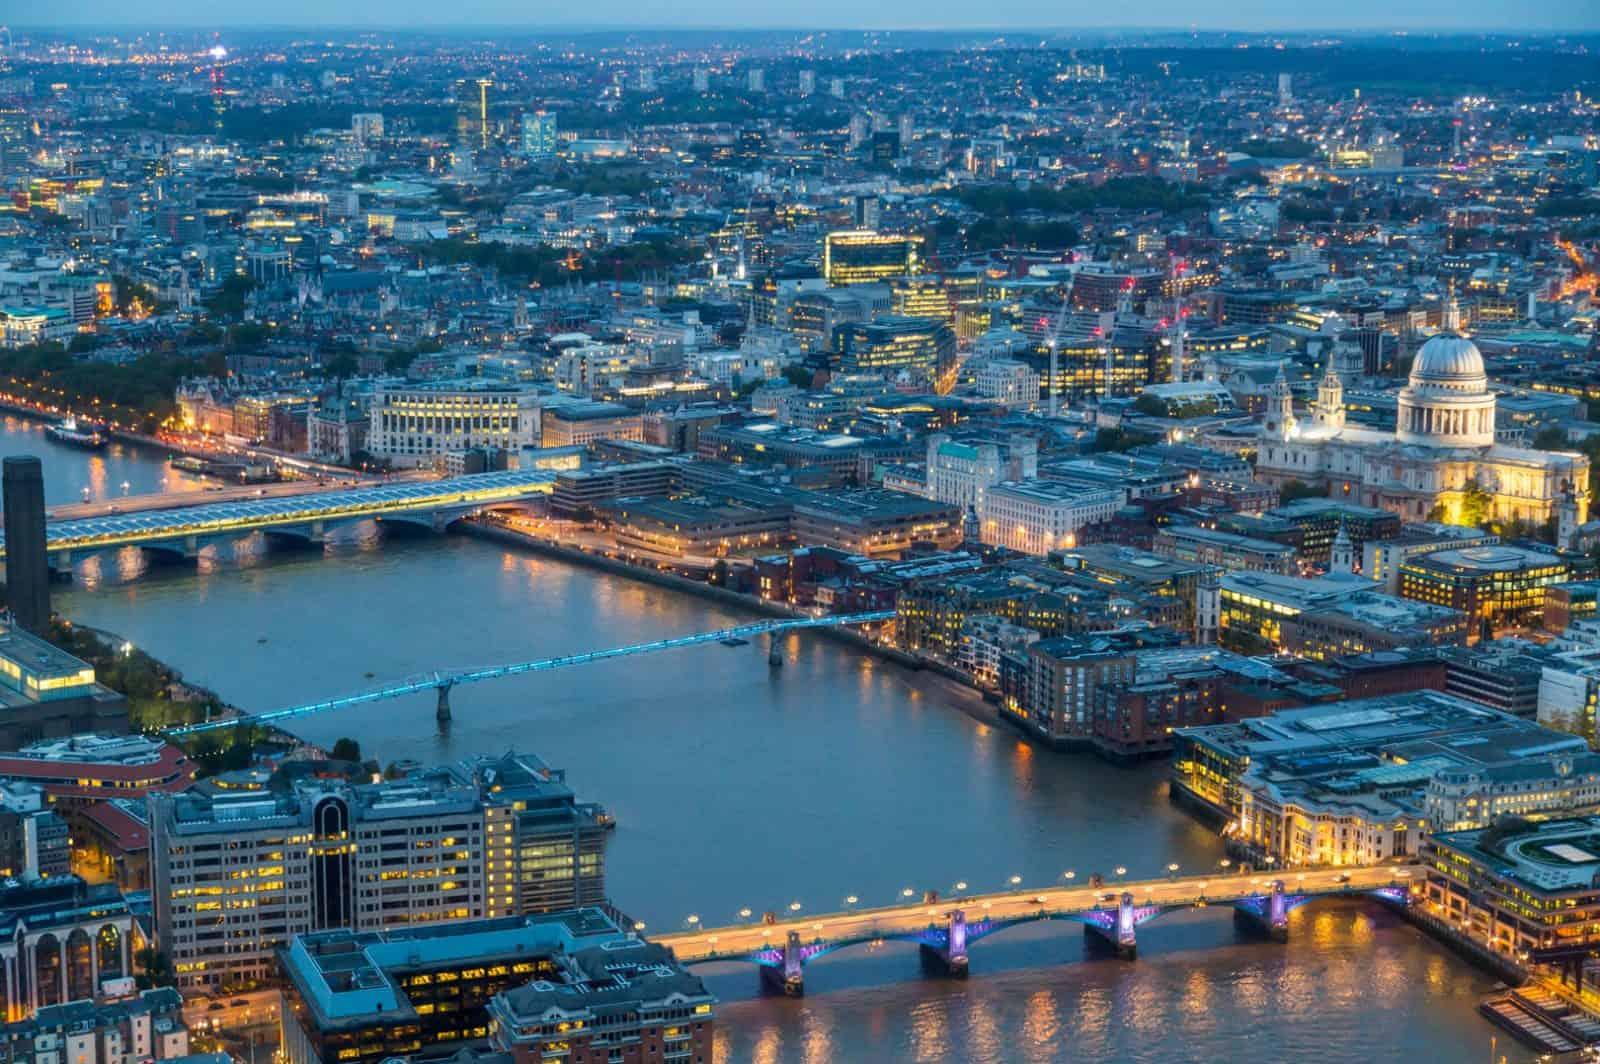 A Thrillseeker's Adventure Guide to London